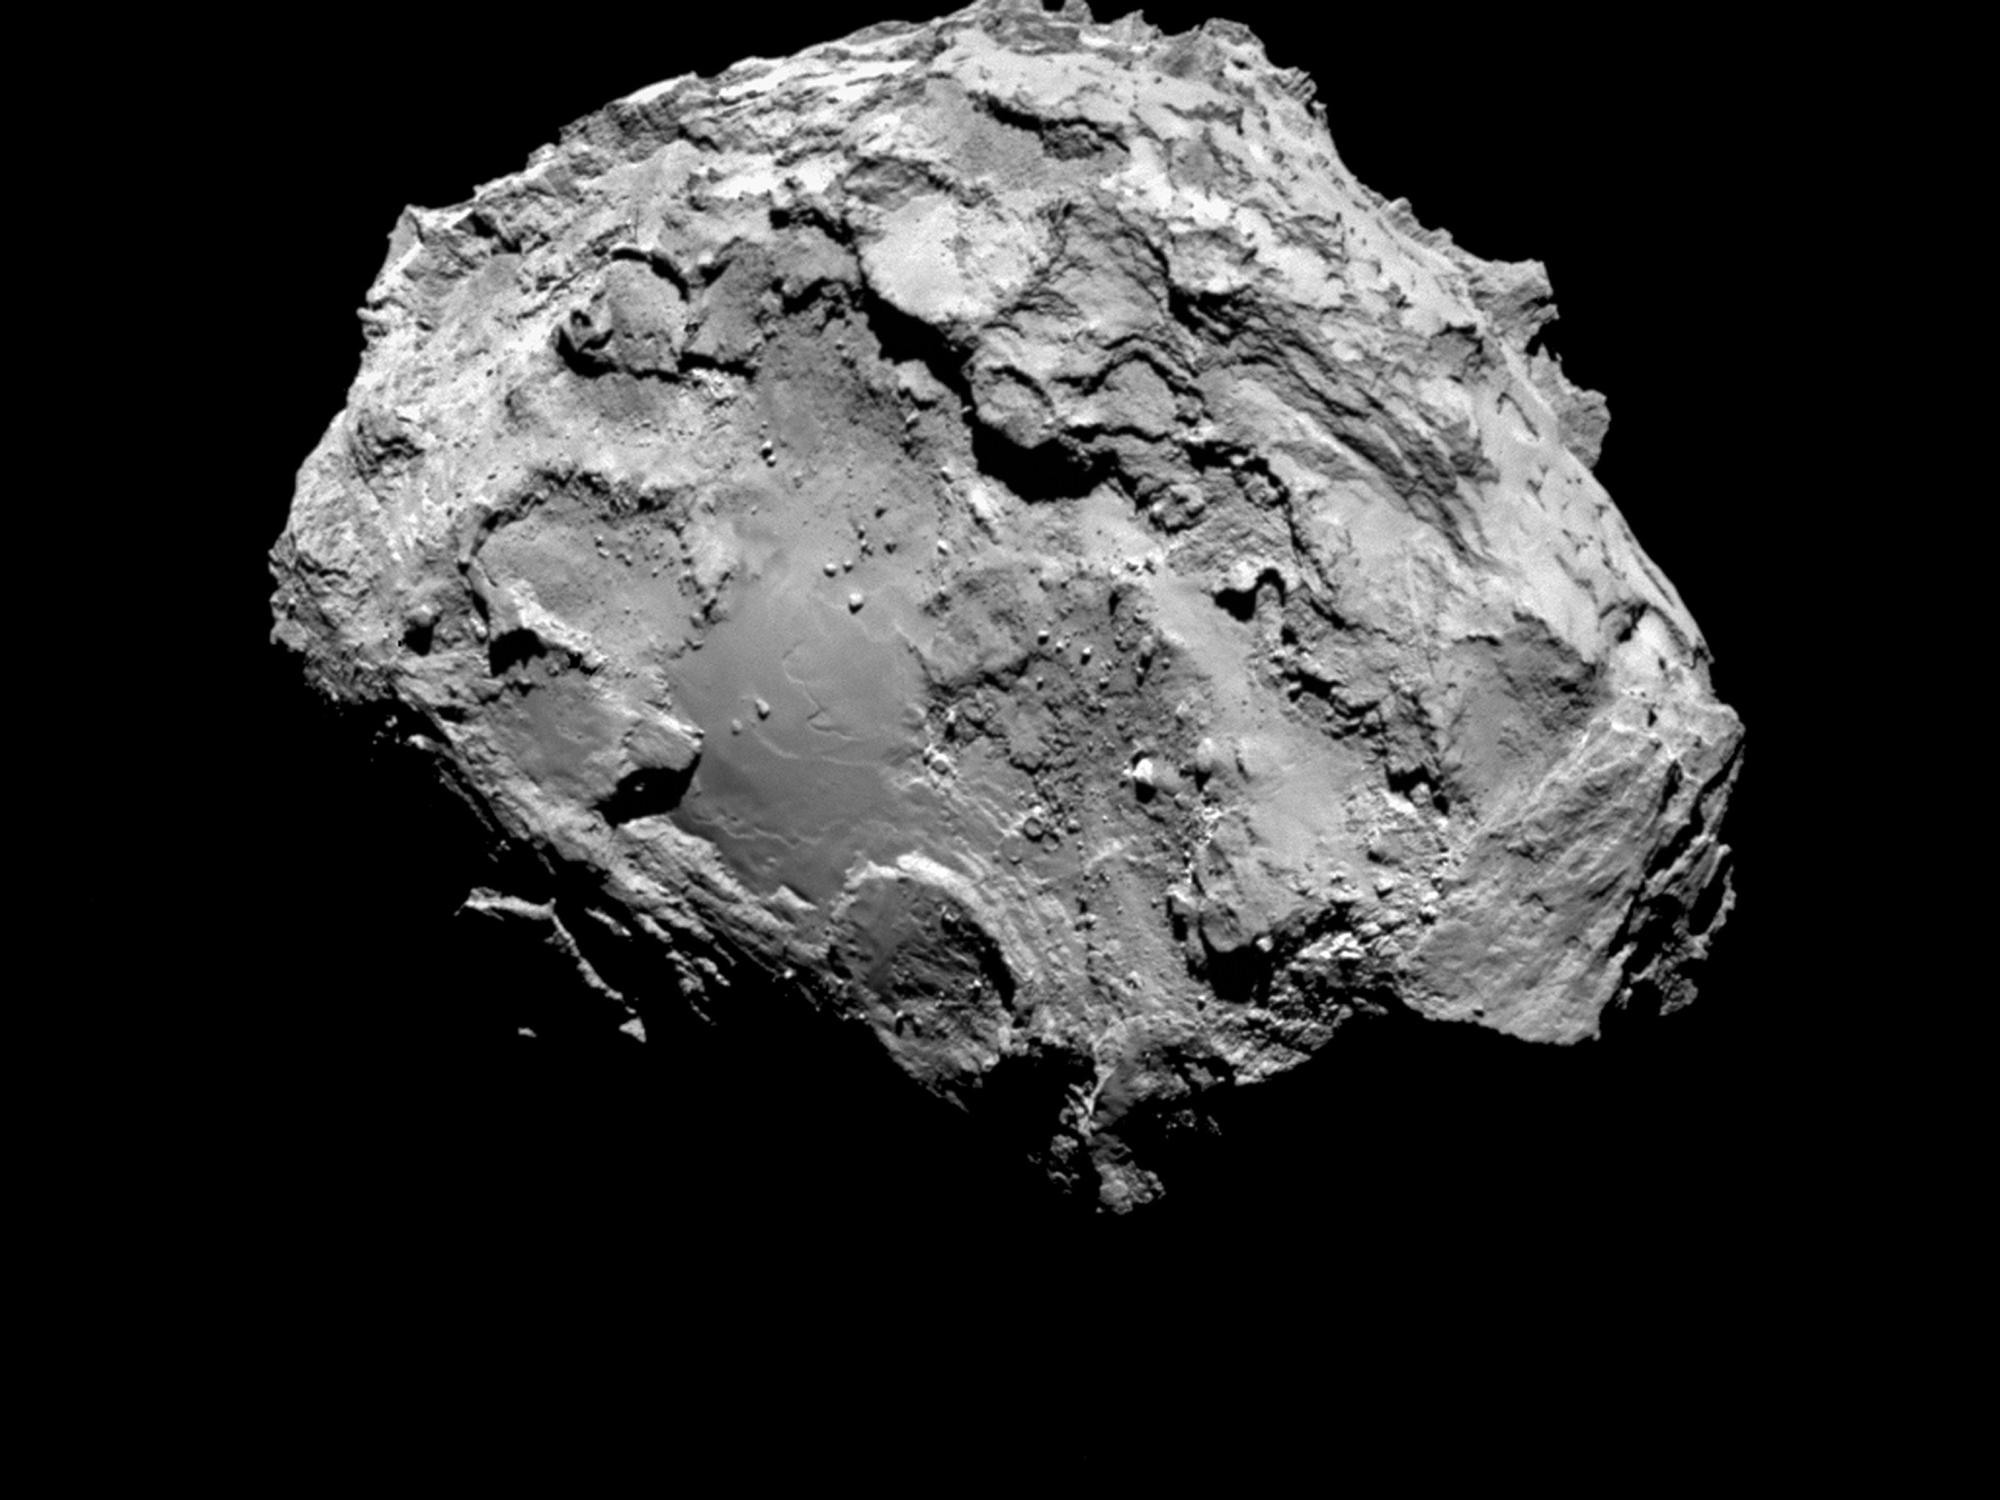 Picture taken on August 3, 2014 by ESA's space probe Rosettas OSIRIS narrow-angle camera shows the Comet 67P/Churyumov-Gerasimenko.